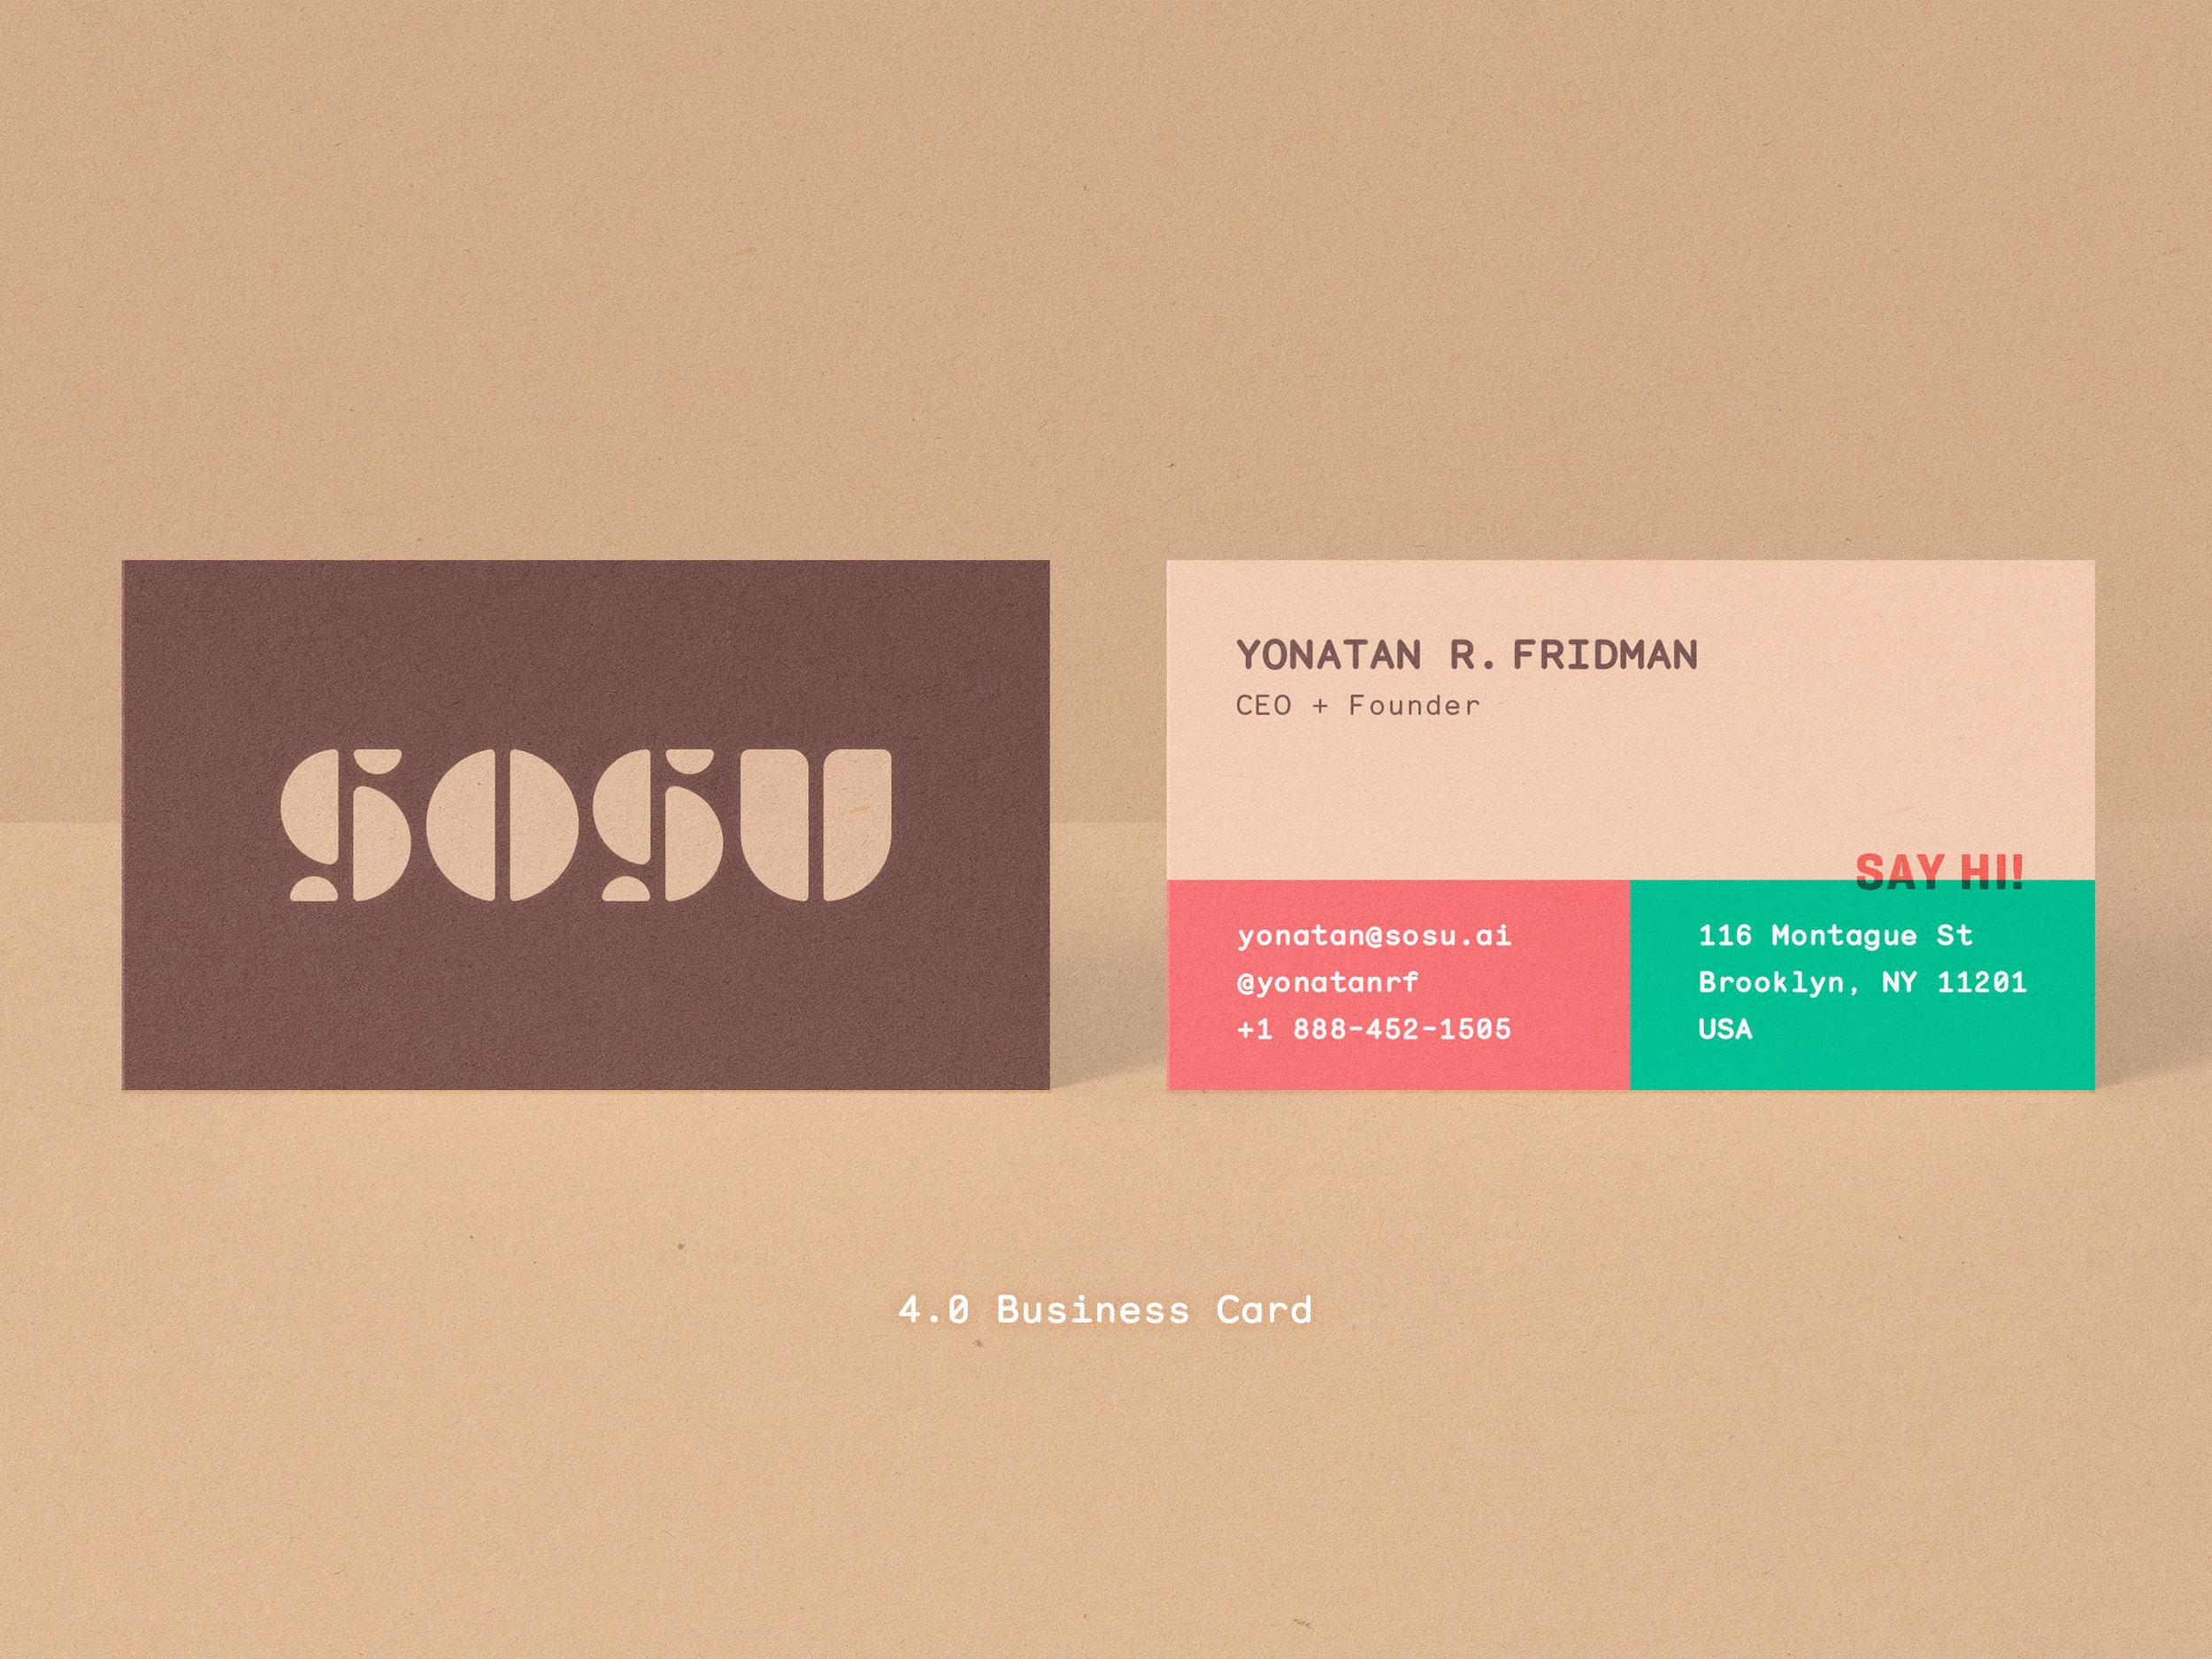 SOSU_BUSINESS_CARD.jpg